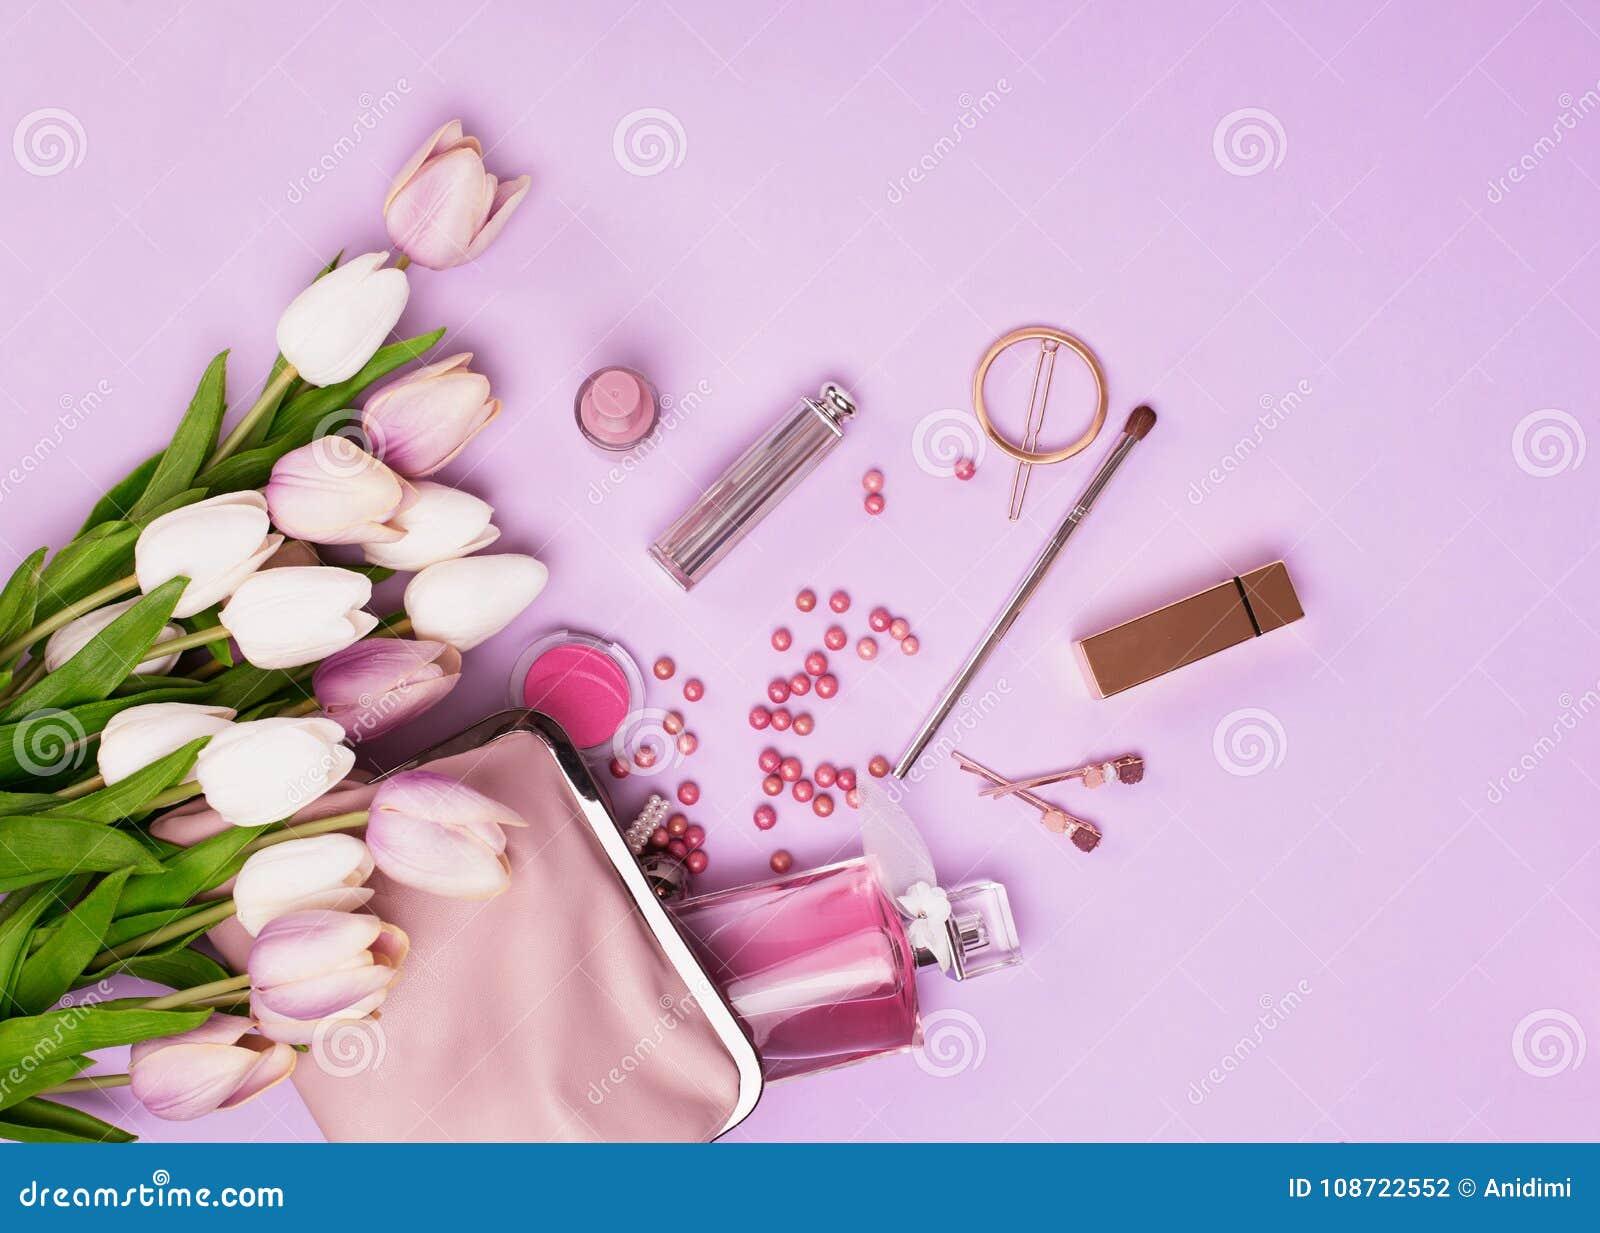 2cb0e07947 Προϊόντα Makeup με την καλλυντικά τσάντα και τα λουλούδια Στοκ ...